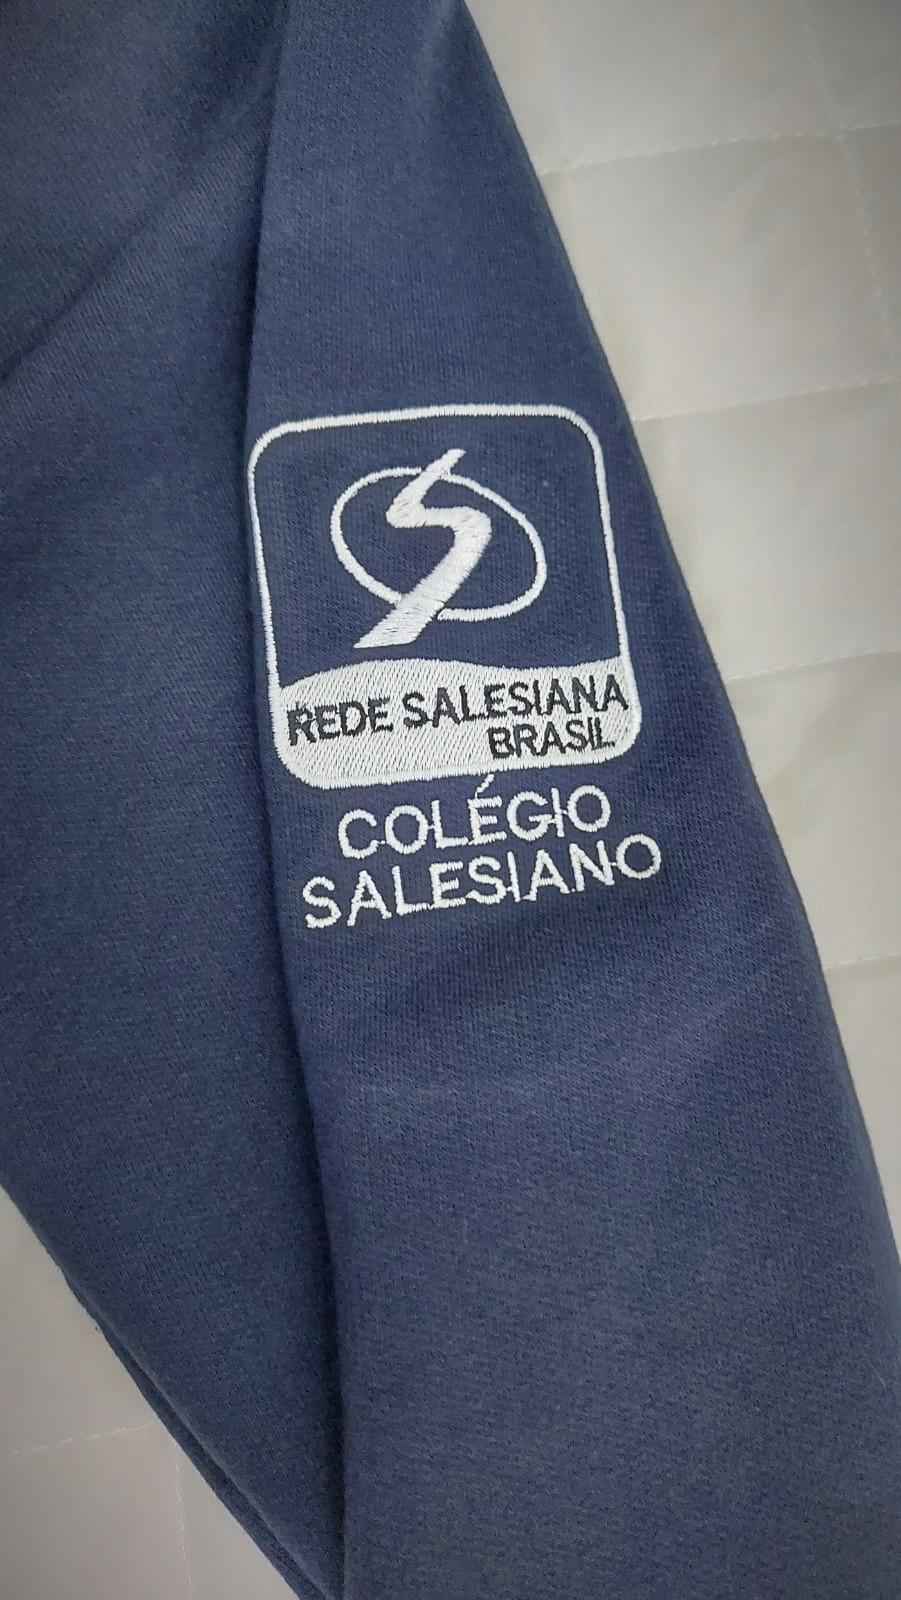 Blusão Moletom Unissex Juvenil COLÉGIO SALESIANO